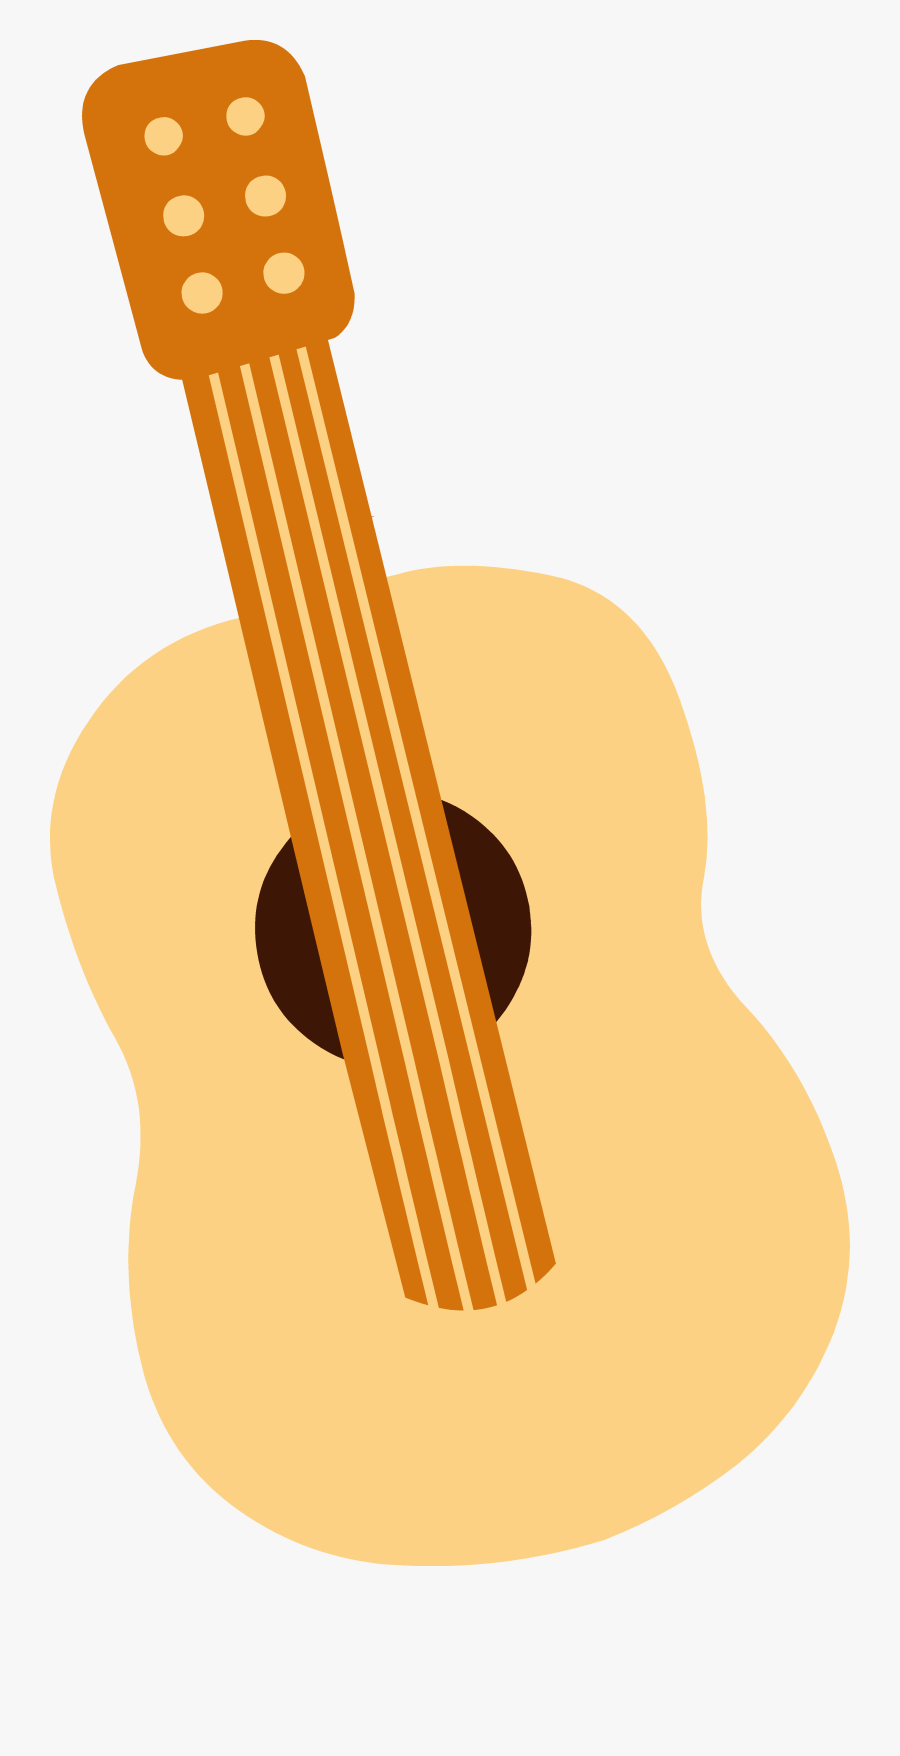 Guitar Images Clip Art : guitar, images, Guitar, Clipart, Images, Transparent, ClipartKey